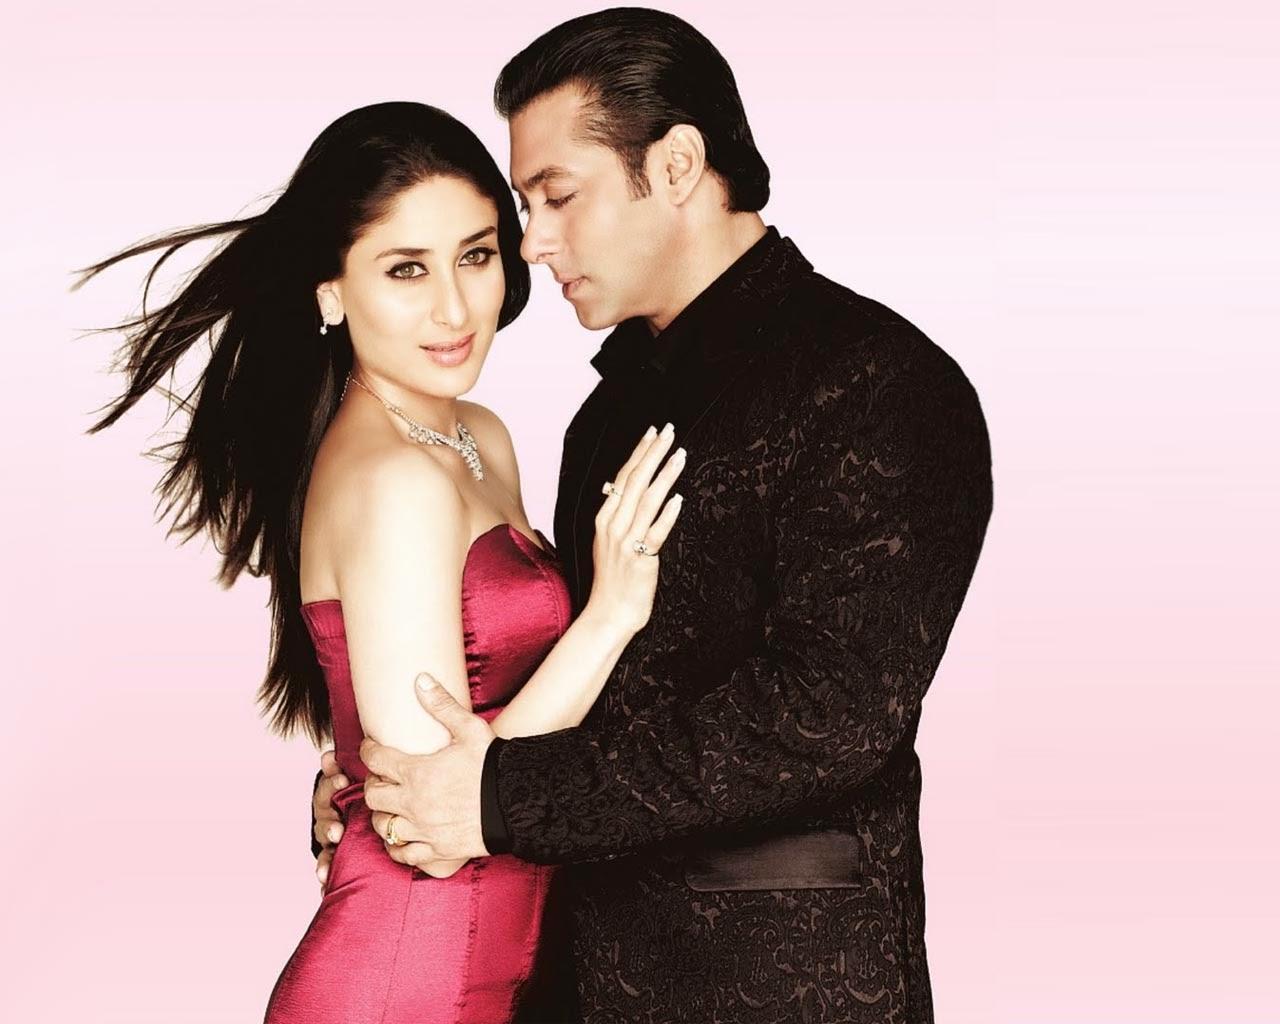 salman khan & kareena kapoor wallpaper download | every couples hd